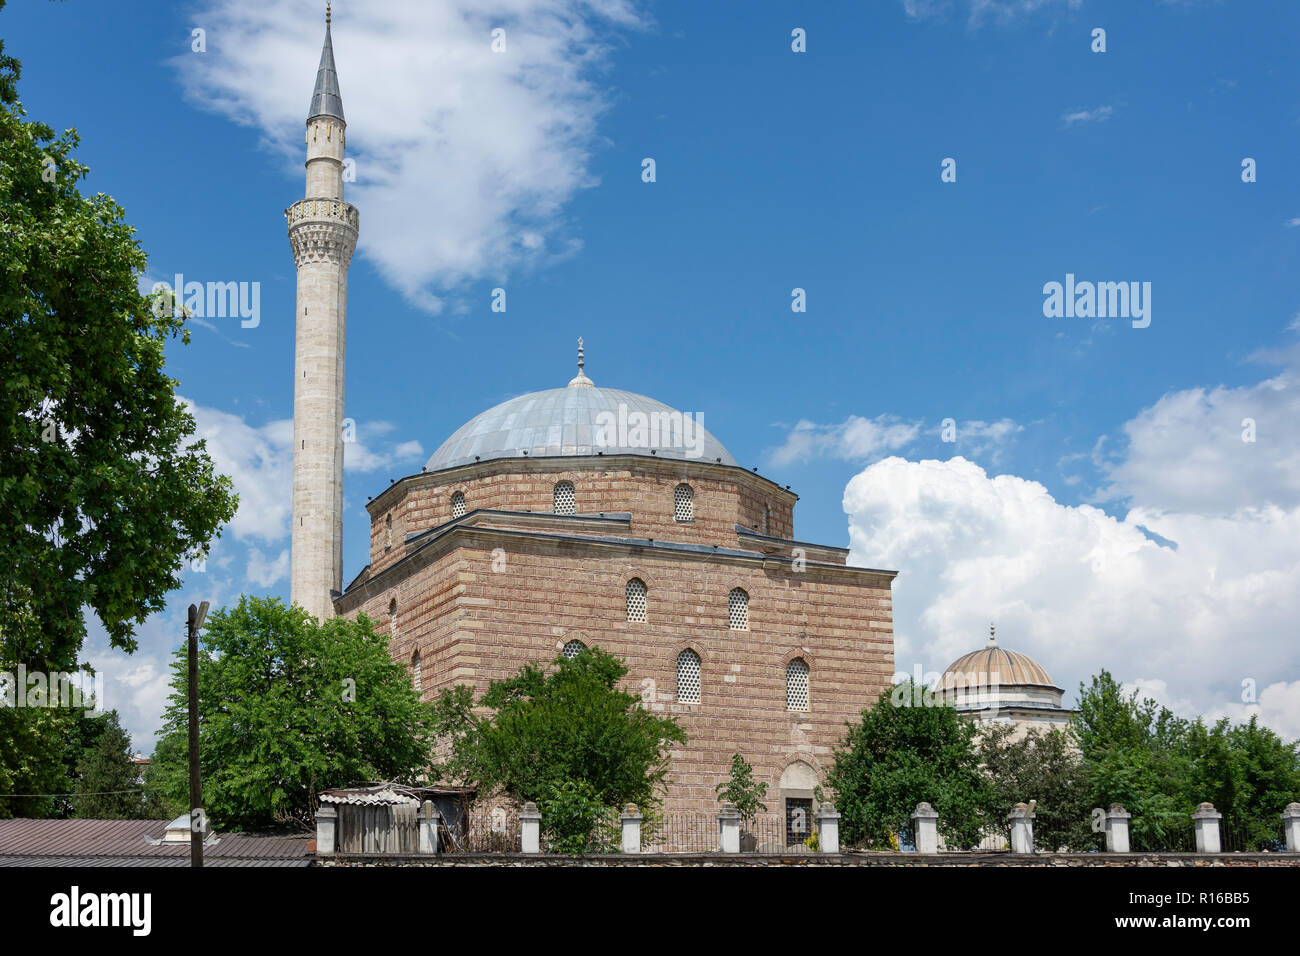 Mustafa Pasha Mosque, The Old Bazaar, Skopje, Skopje Region, Republic of North Macedonia - Stock Image